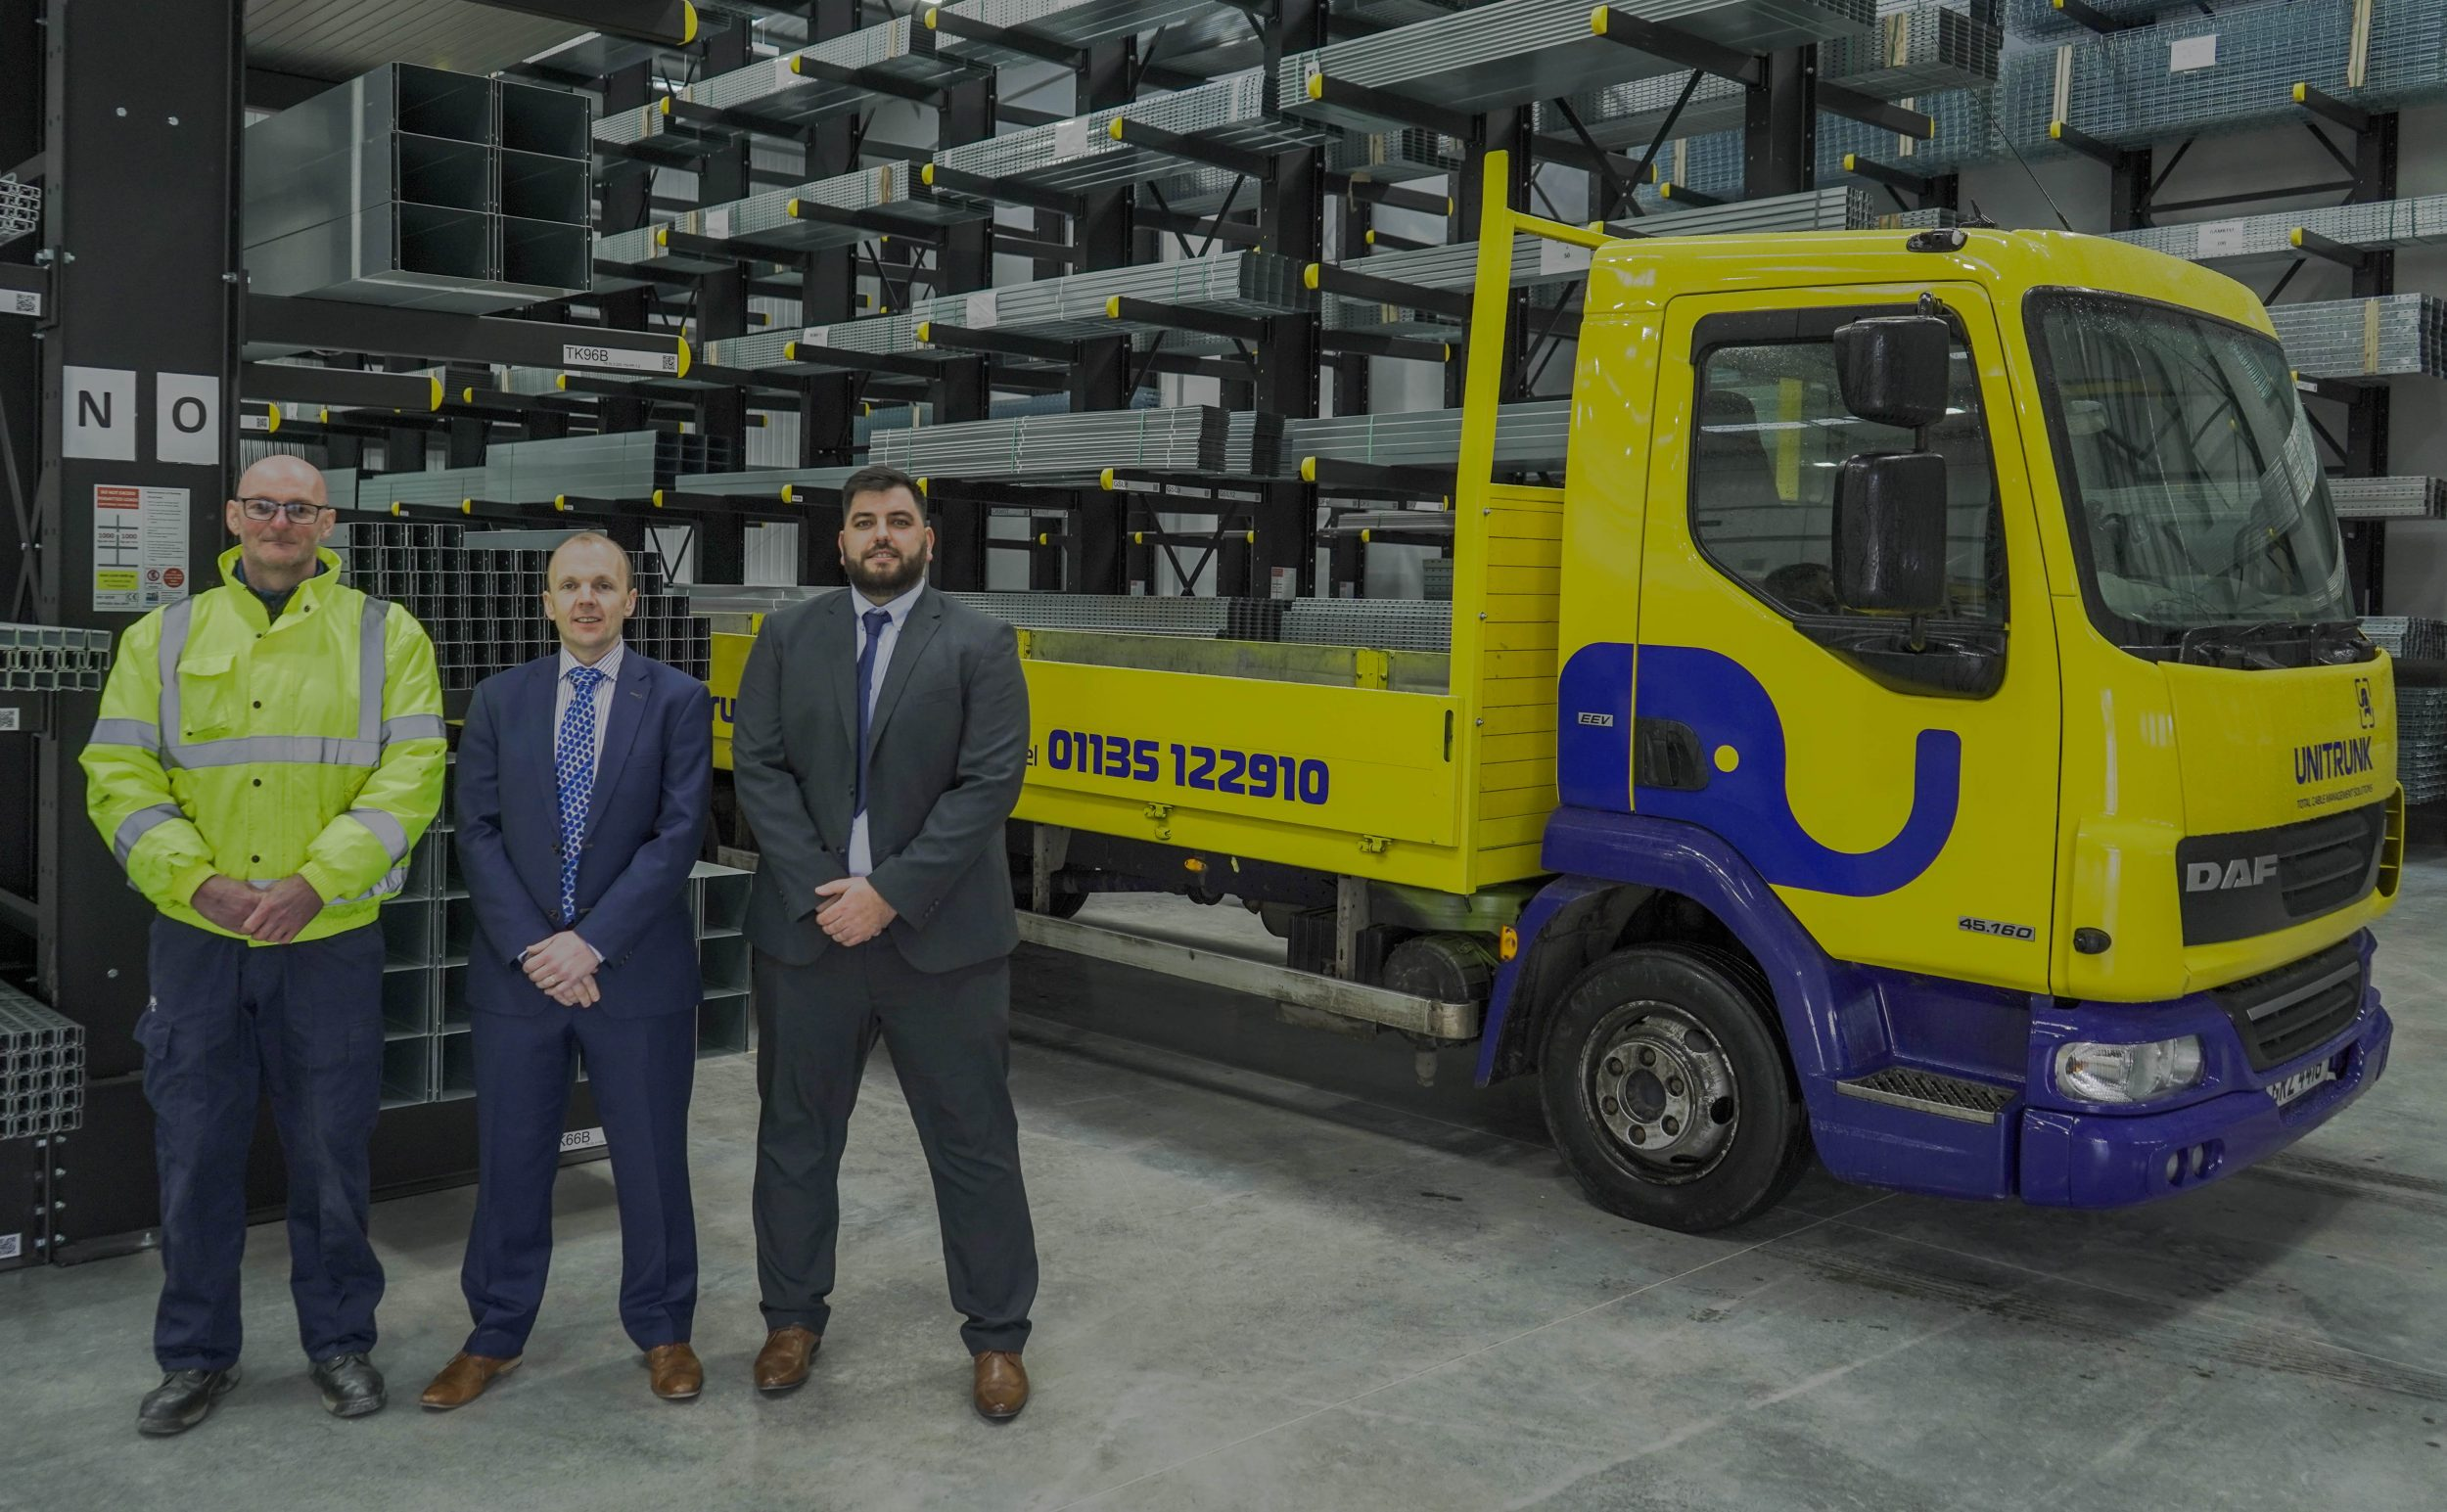 Unitrunk Opens Depot In Yorkshire